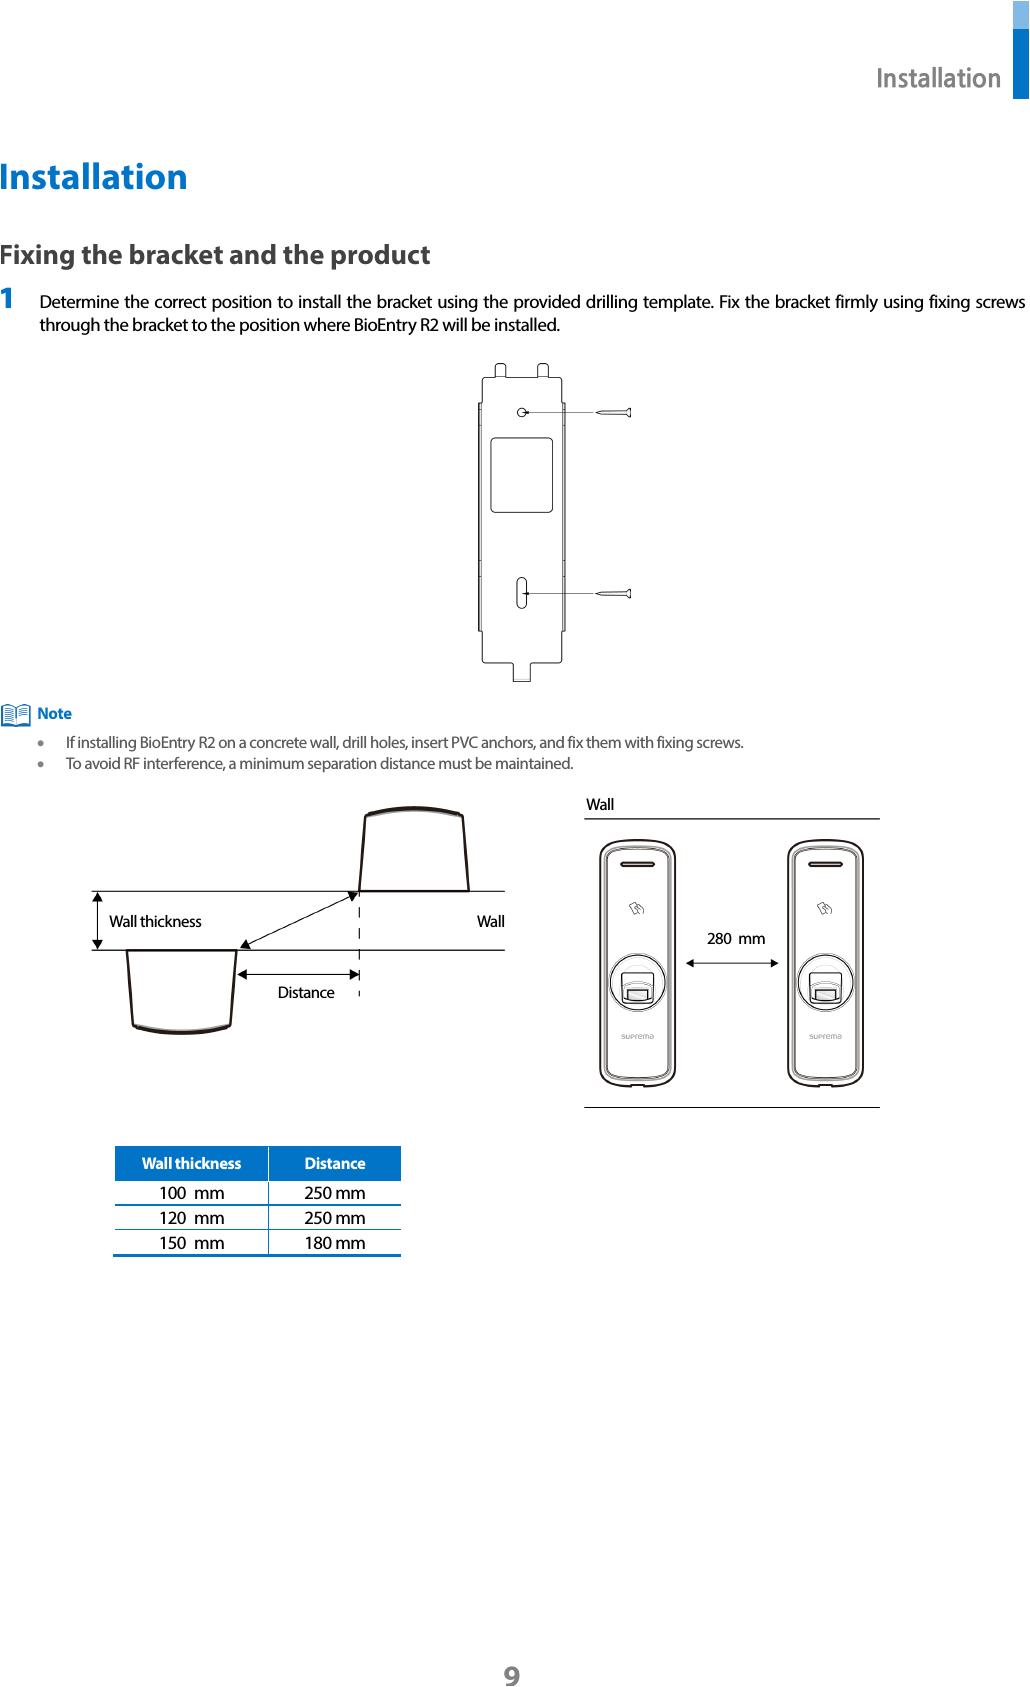 suprema bioentry plus wiring diagram awesome ber2 od bioentry r2 user manual users manual suprema inc